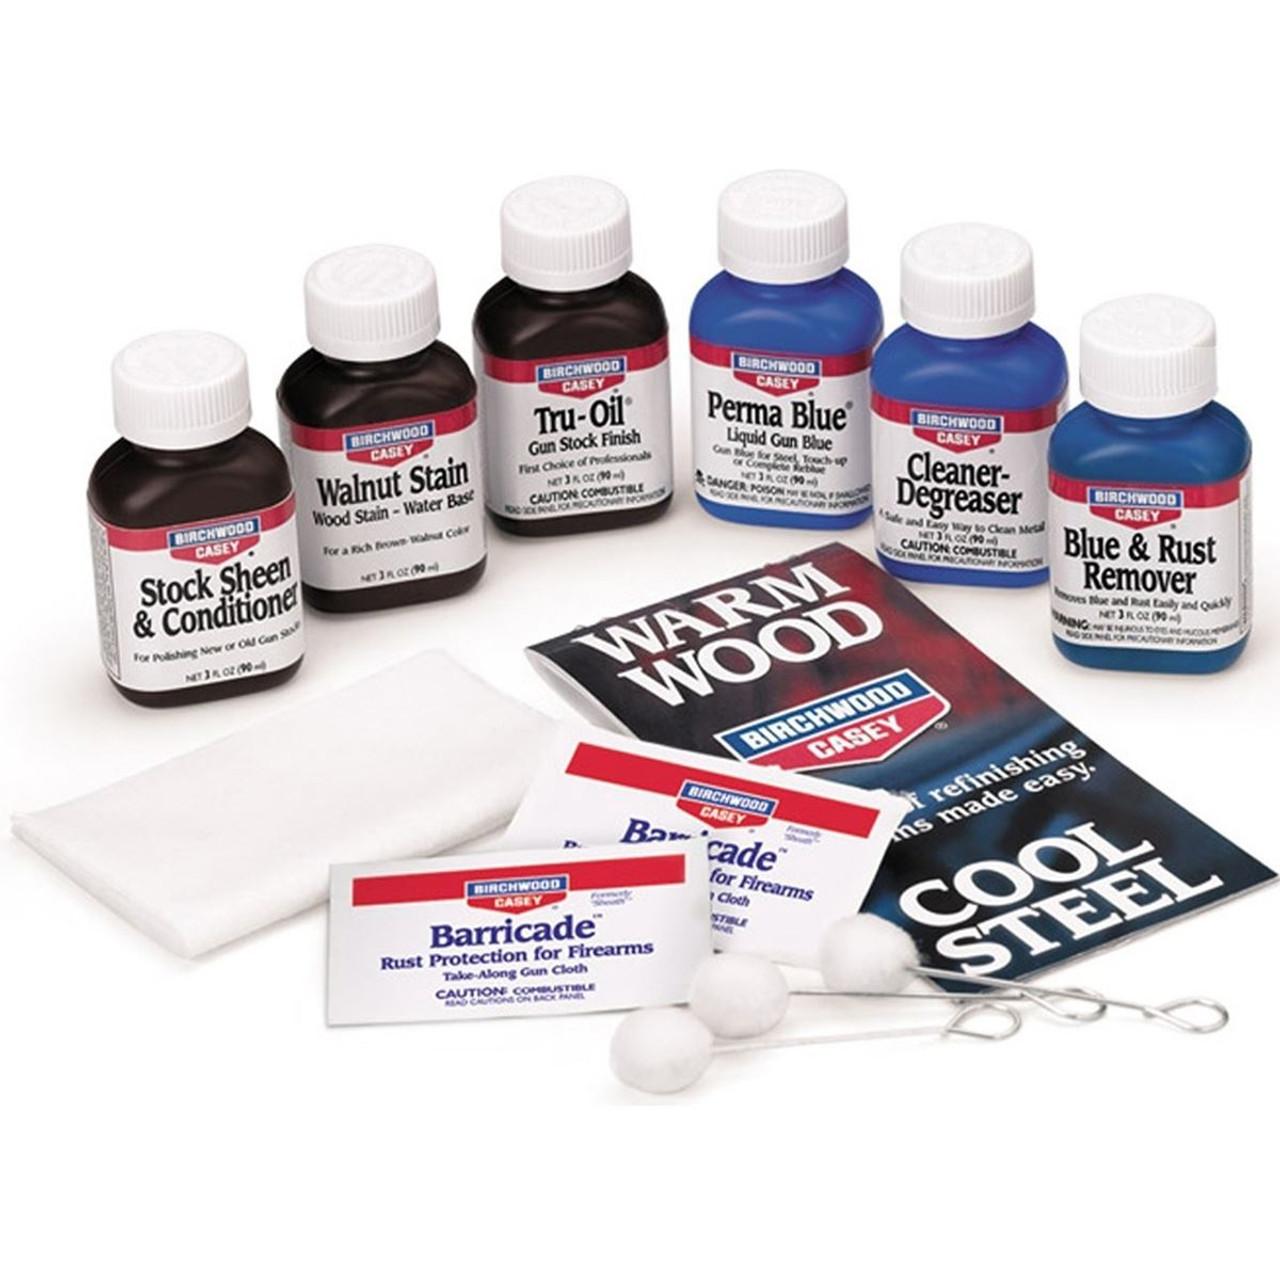 Birchwood Casey Perma Blue & Tru Oil Kit